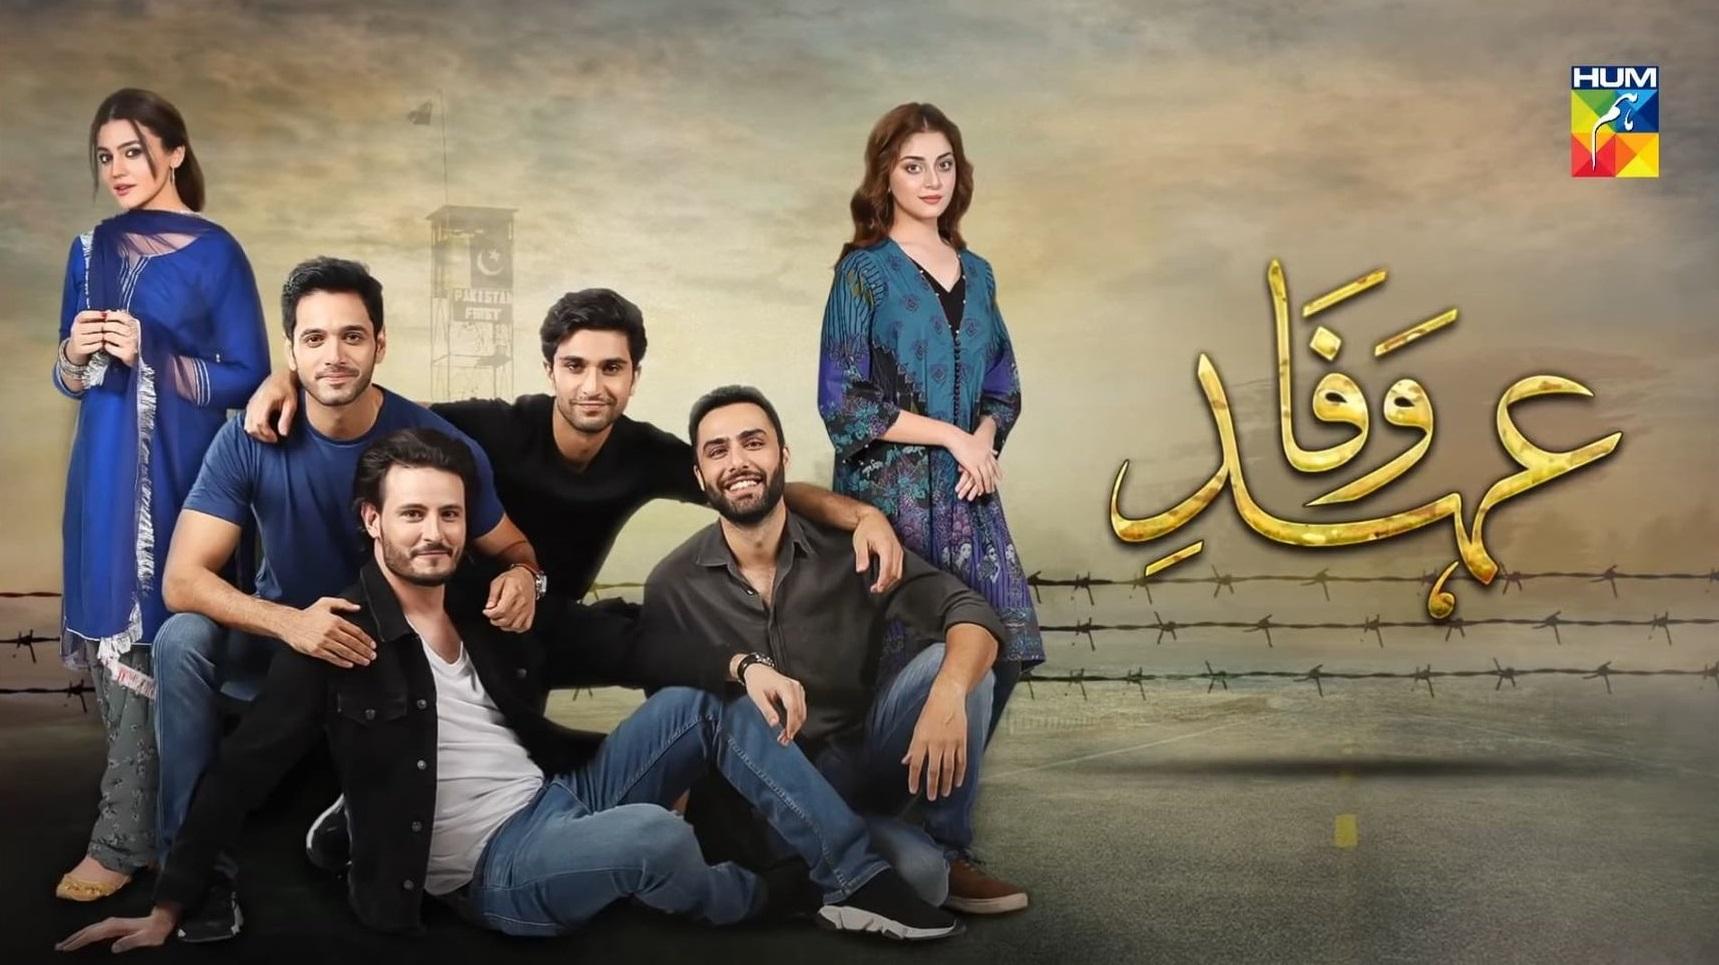 Pakistani Dramas That Didn't Revolve Around Typical & Toxic Themes